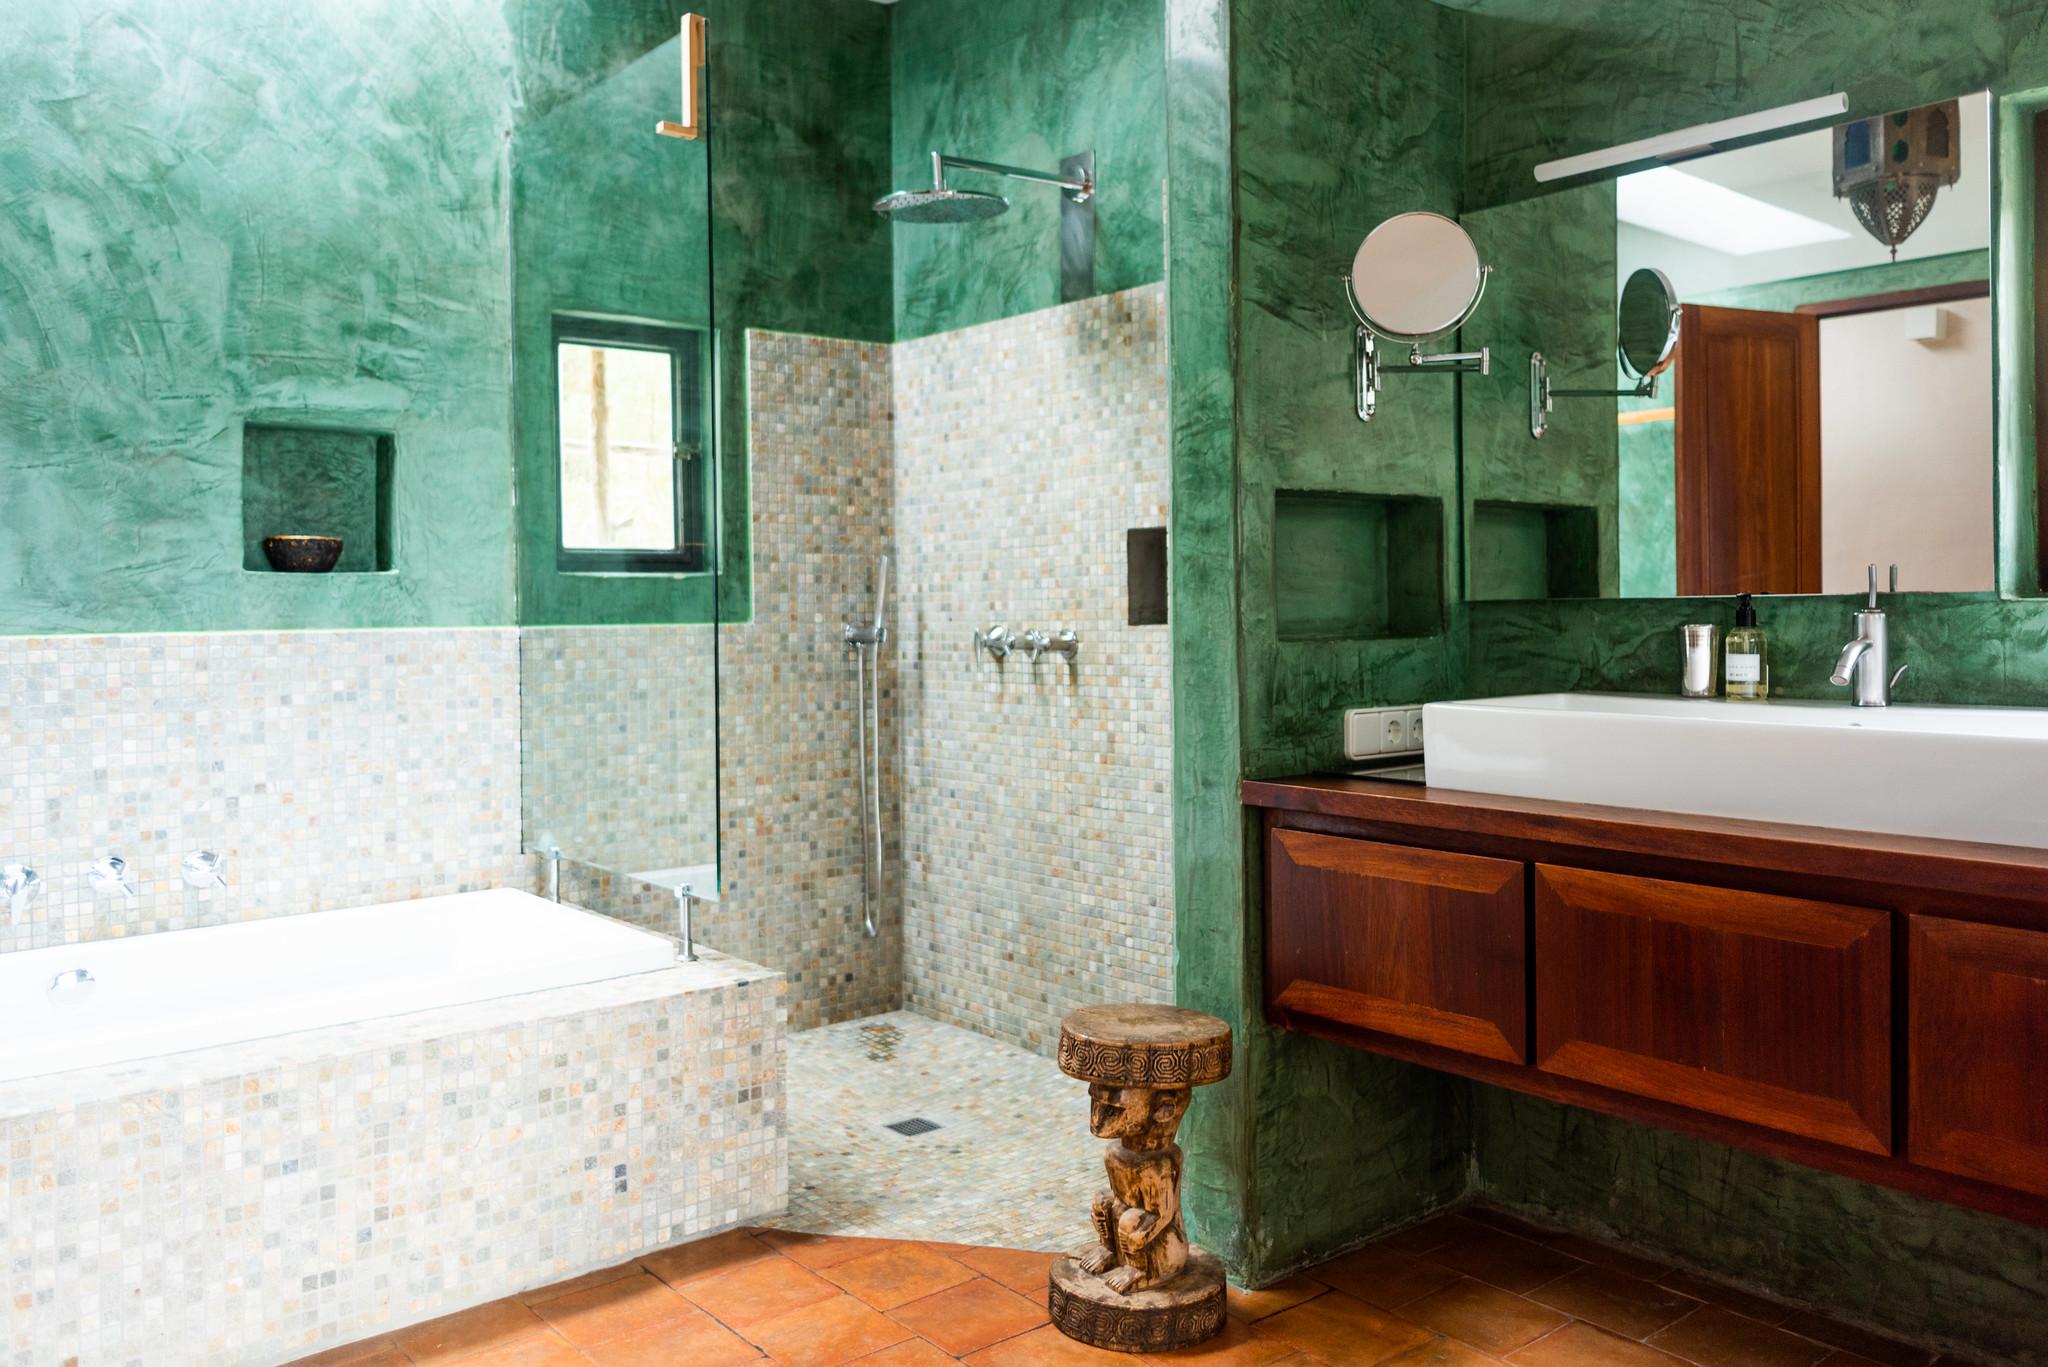 https://www.white-ibiza.com/wp-content/uploads/2020/05/white-ibiza-villas-can-lyra-bathroom.jpg